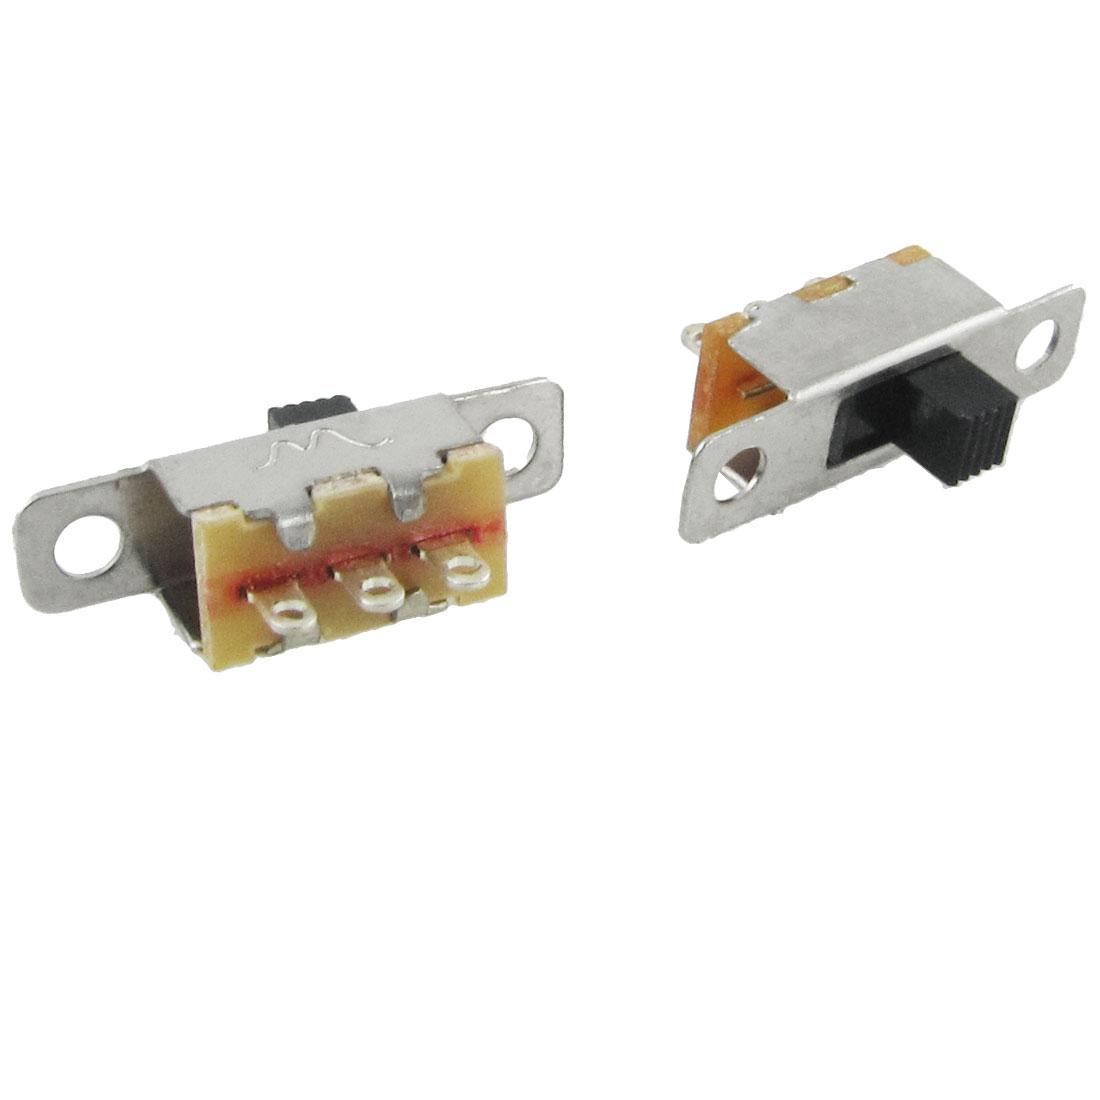 5 Pcs x On-Off 2 Position SPDT 1P2T Panel Mini Slide Switch Solder Lug SS12F15G3